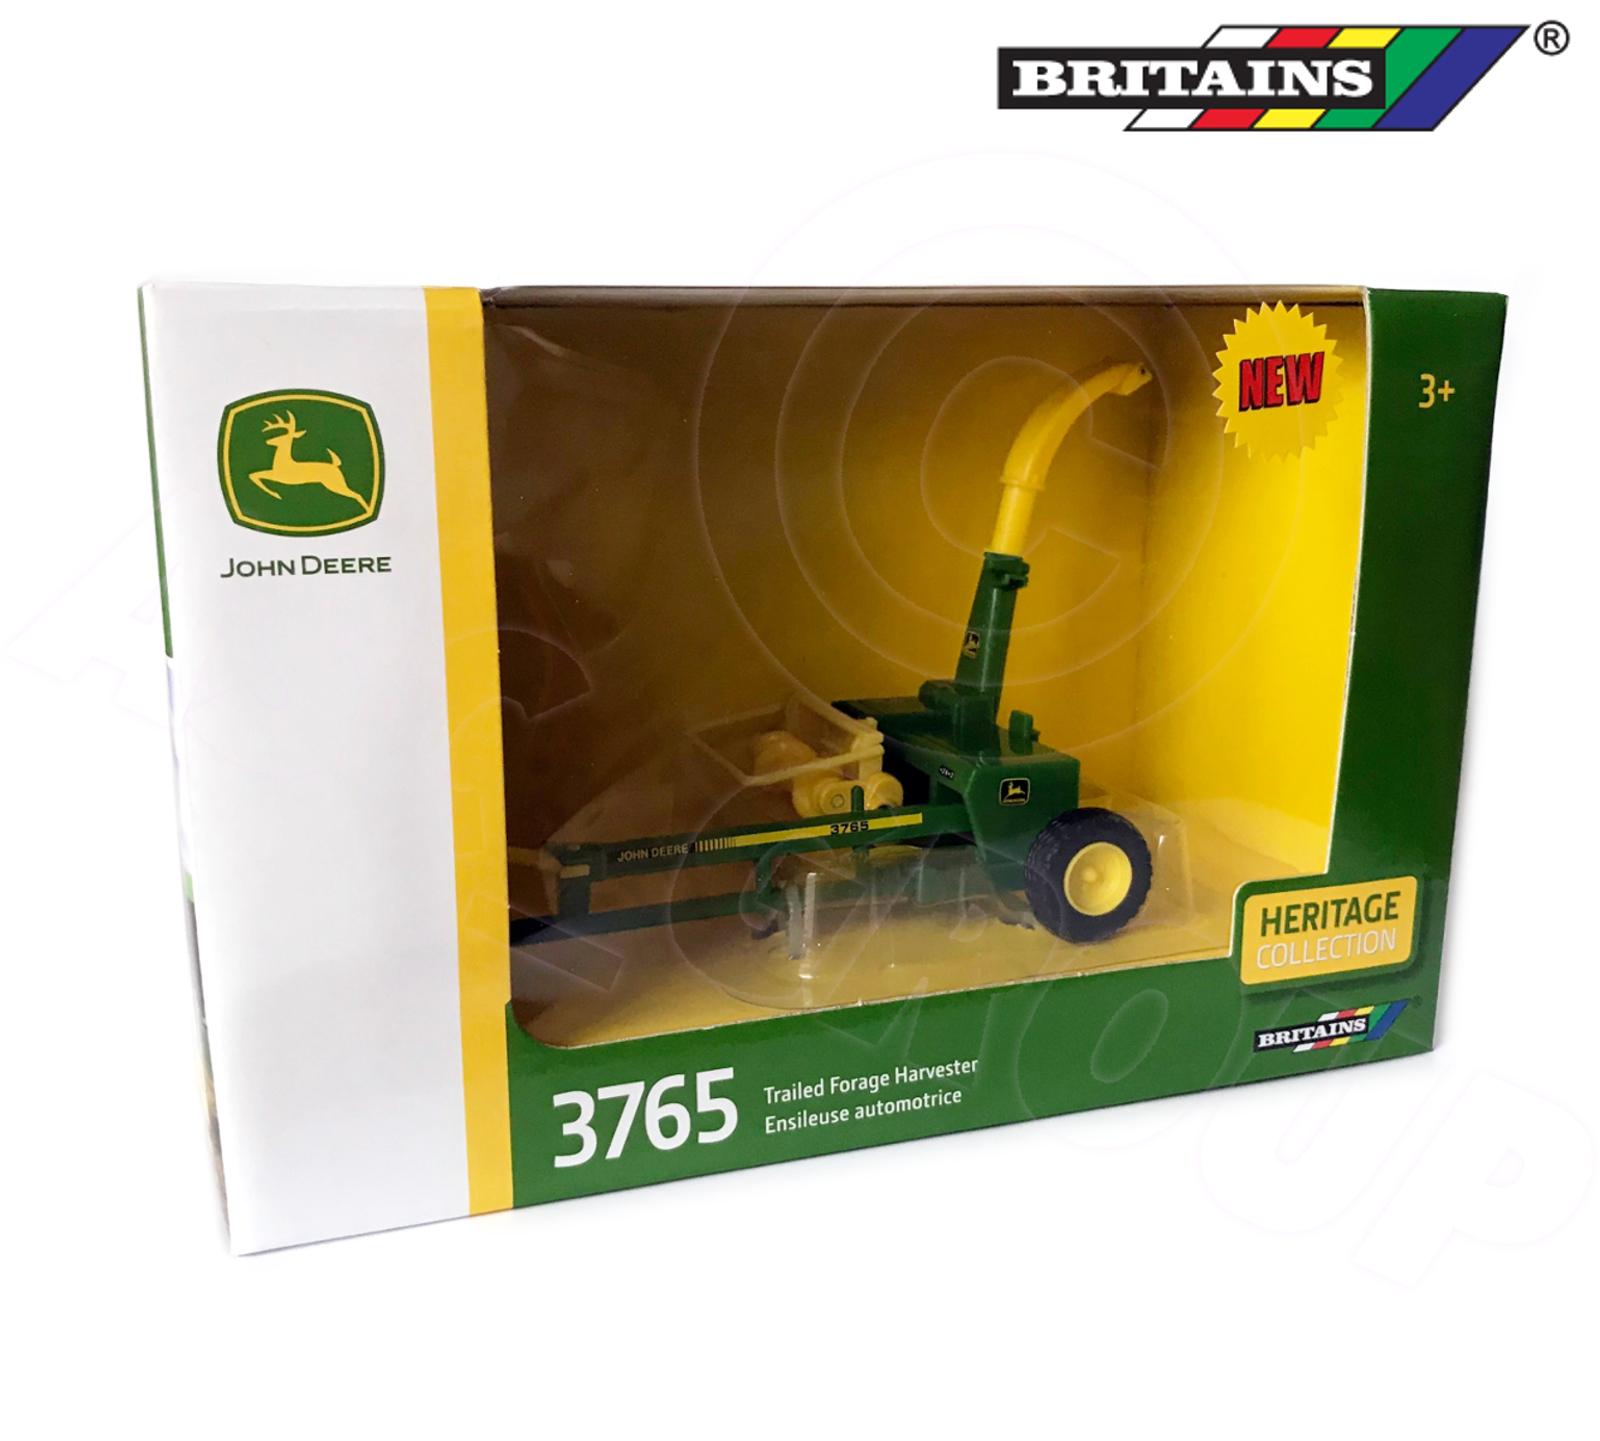 BRITAINS John Deere Trailed Forage Harvester 1:32 Diecast Farm Vehicle 43152A1